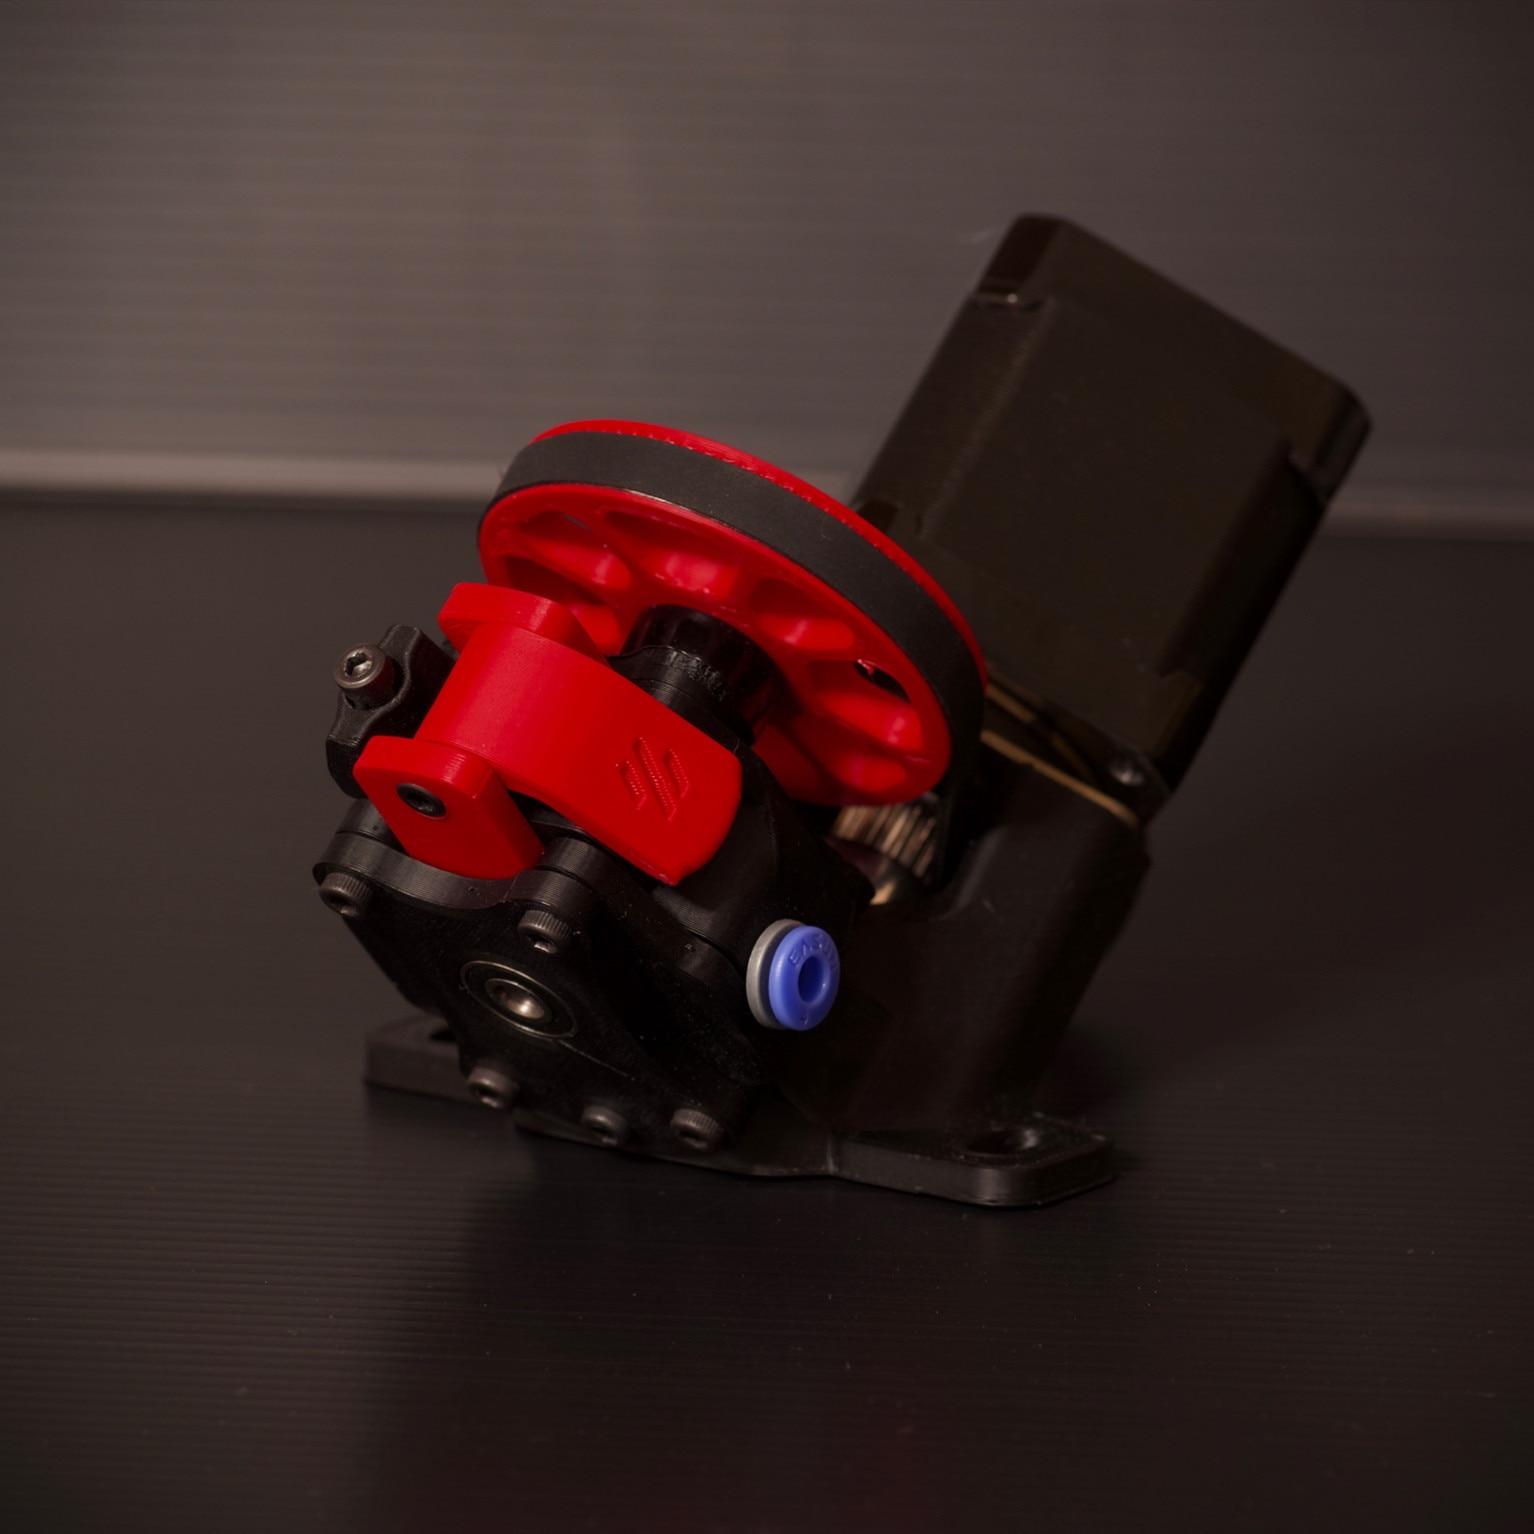 Blurolls Voron 2.2 3d Printer Mobius 3.1 Extruder Full Kit Includes Gates 2GT-188 Belt 2GT 20T Pulley Motor